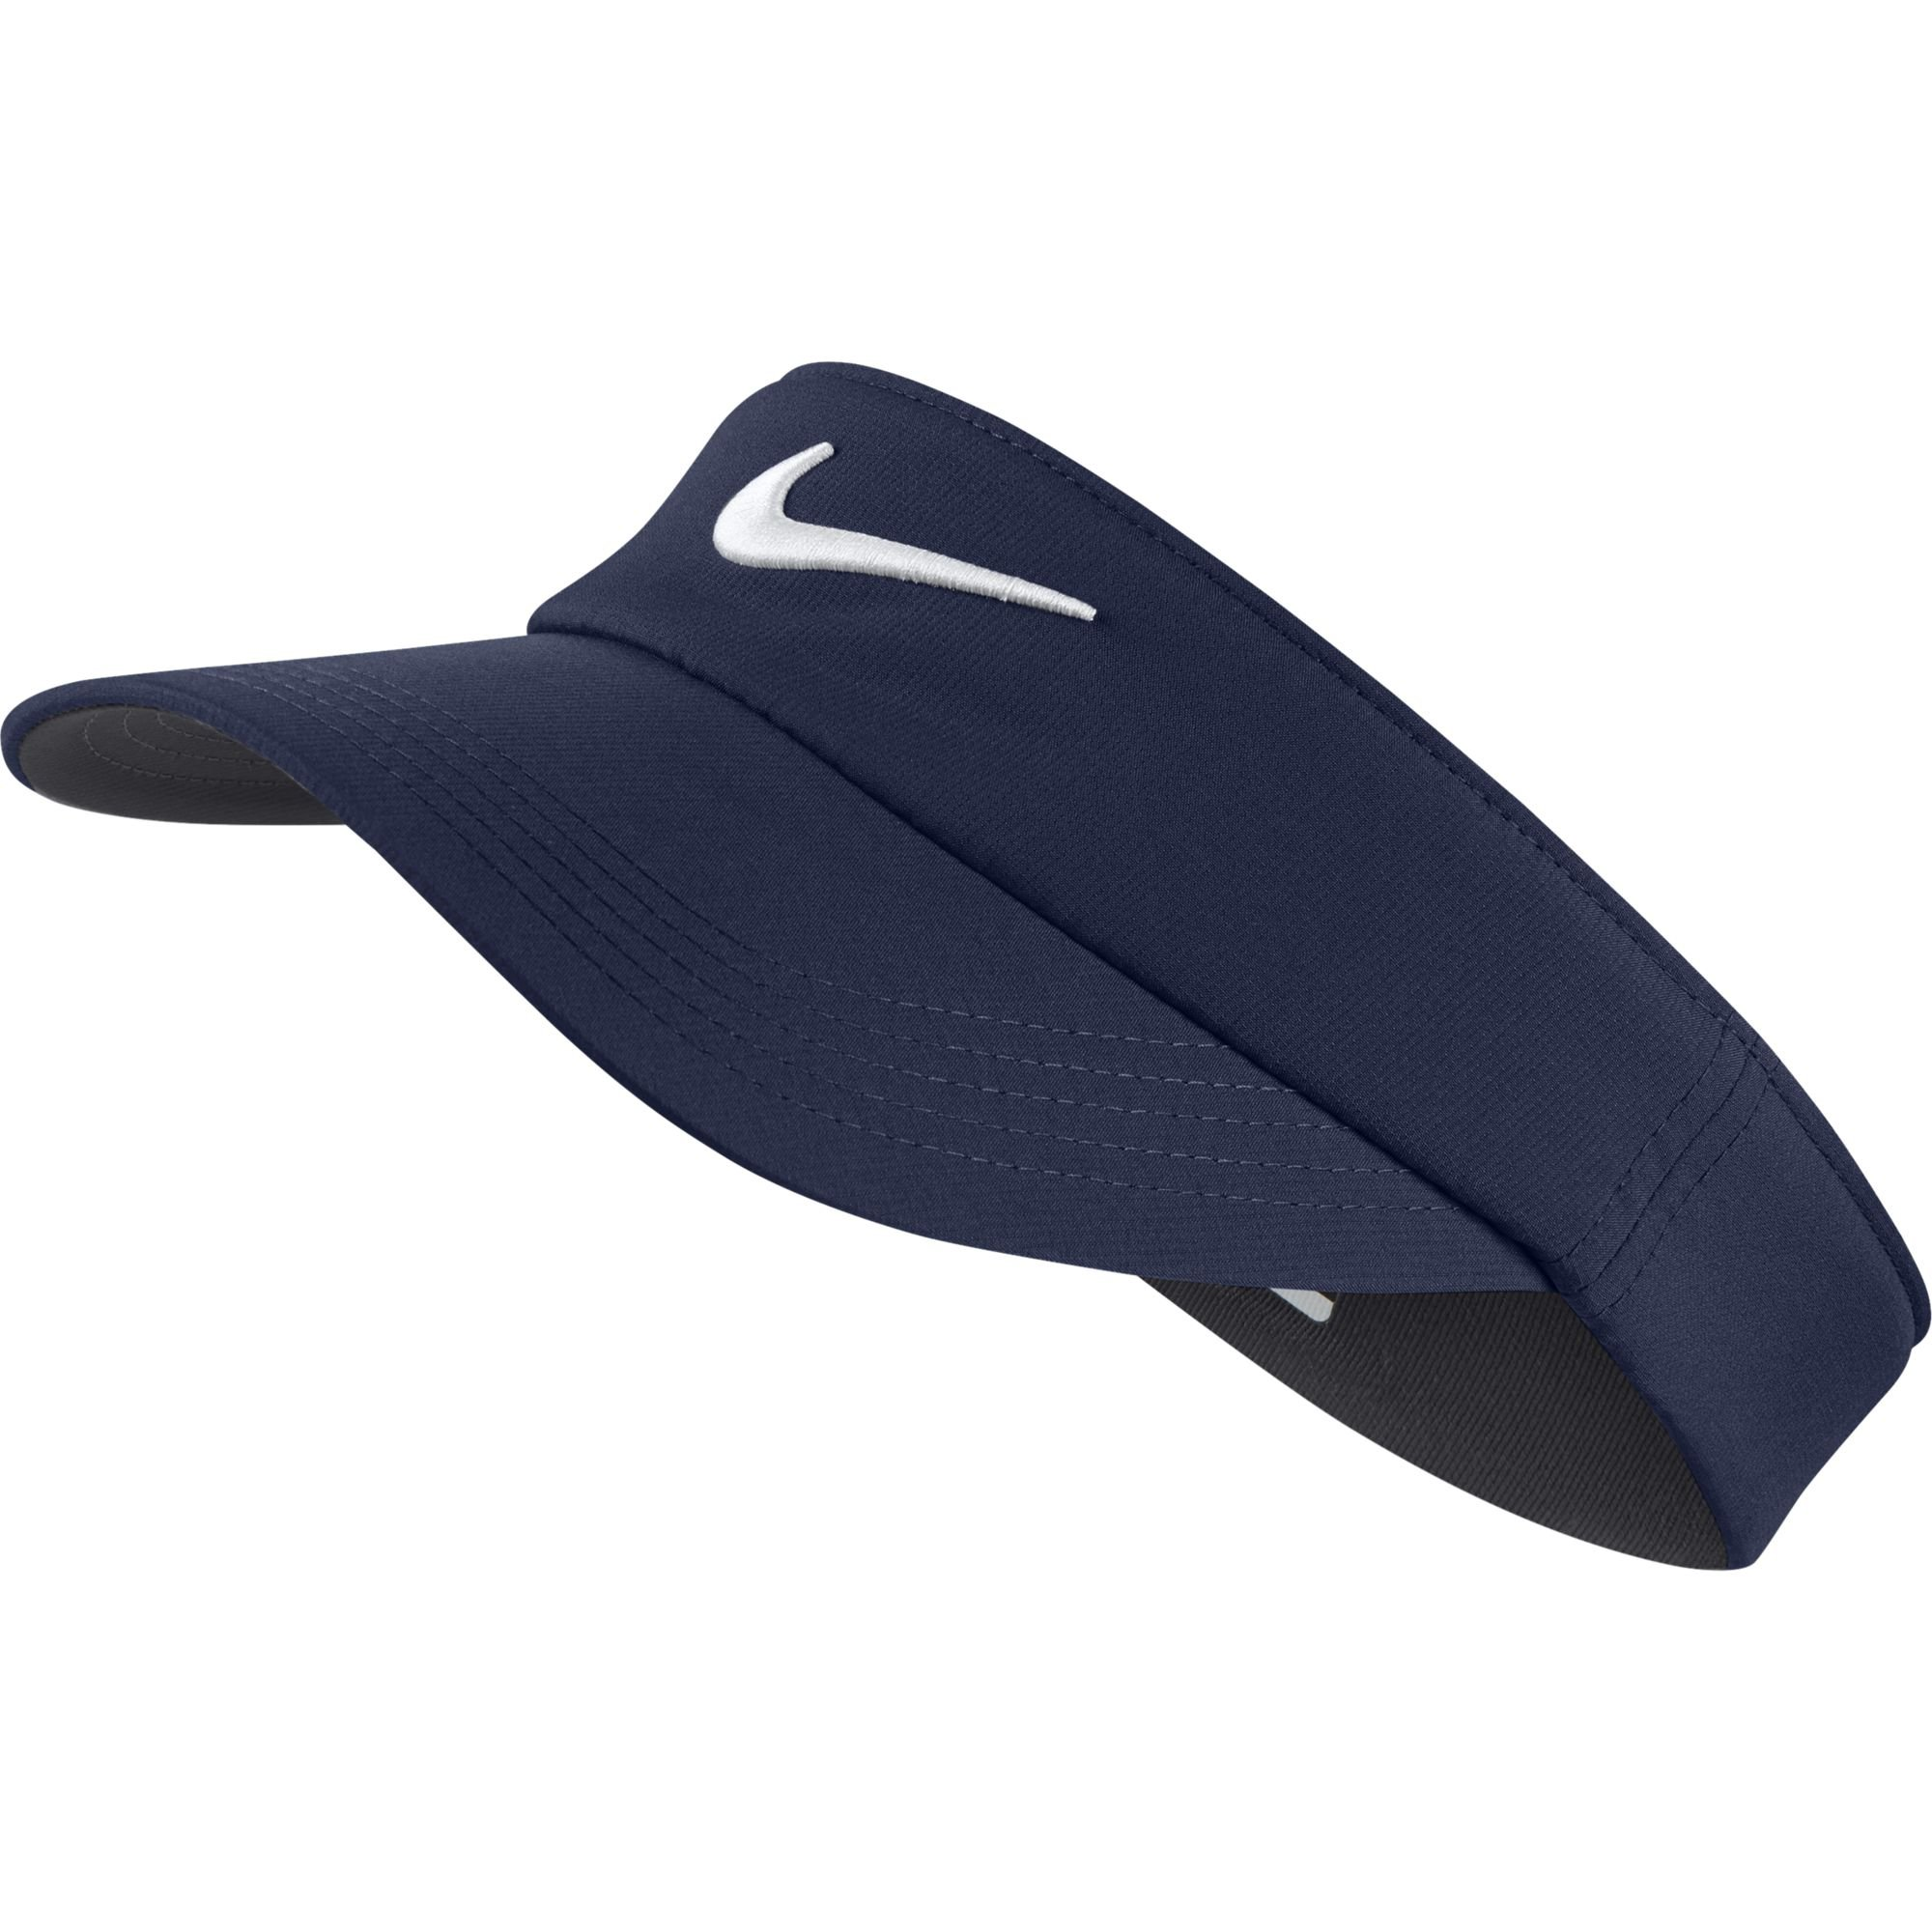 NIKE Unisex Core Golf Visor, Midnight Navy/Anthracite/White, One Size by NIKE